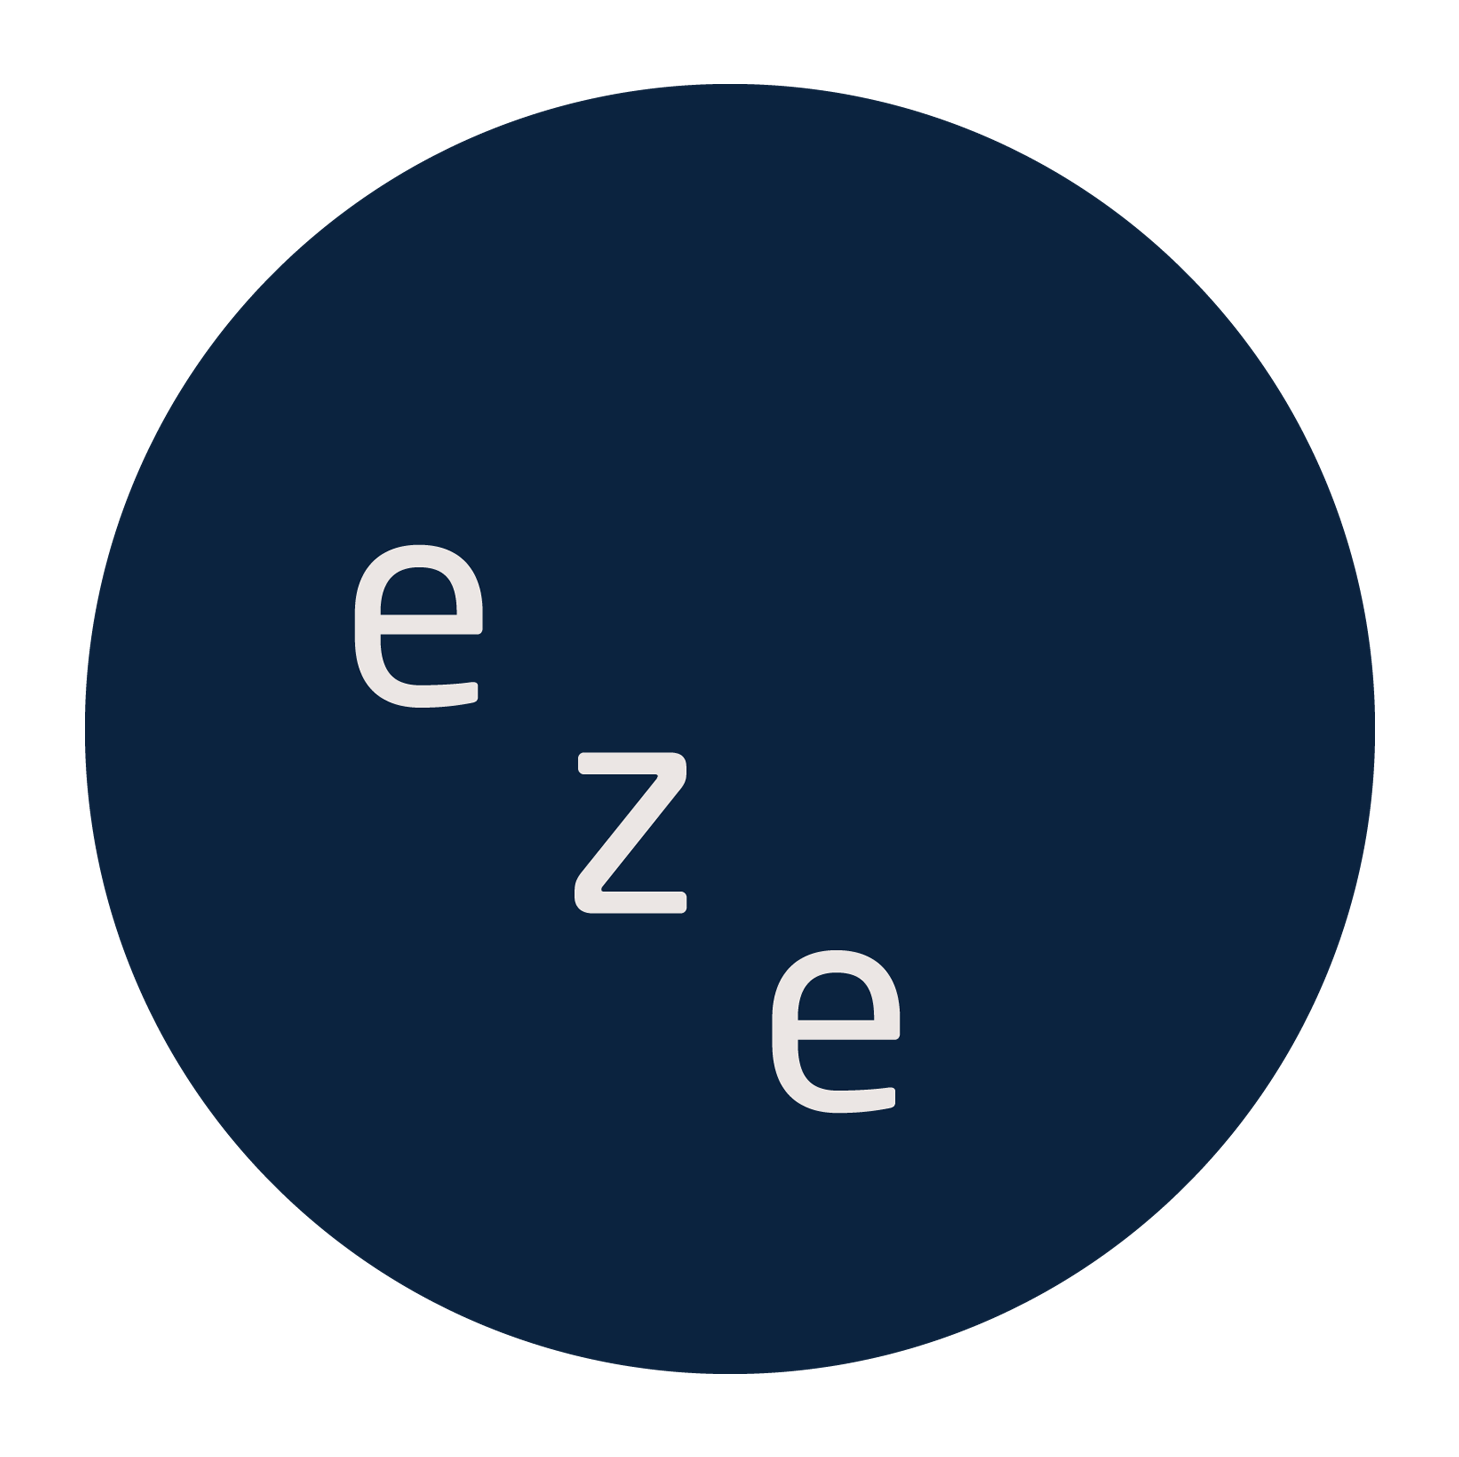 Logotipo para celular